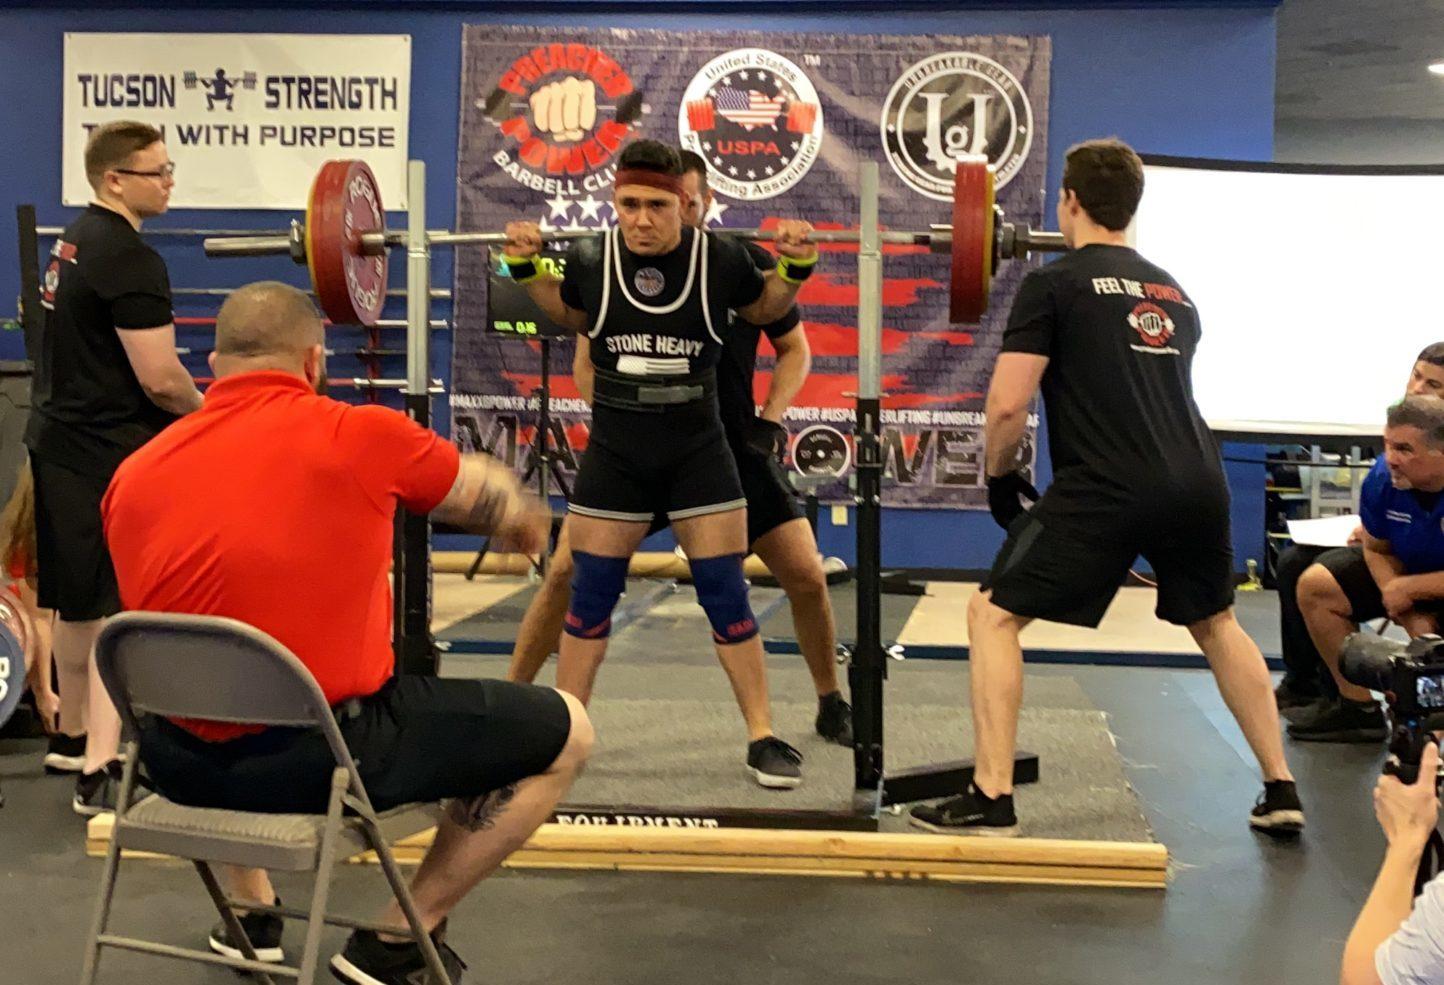 USPA Powerlifting Tucson gyms